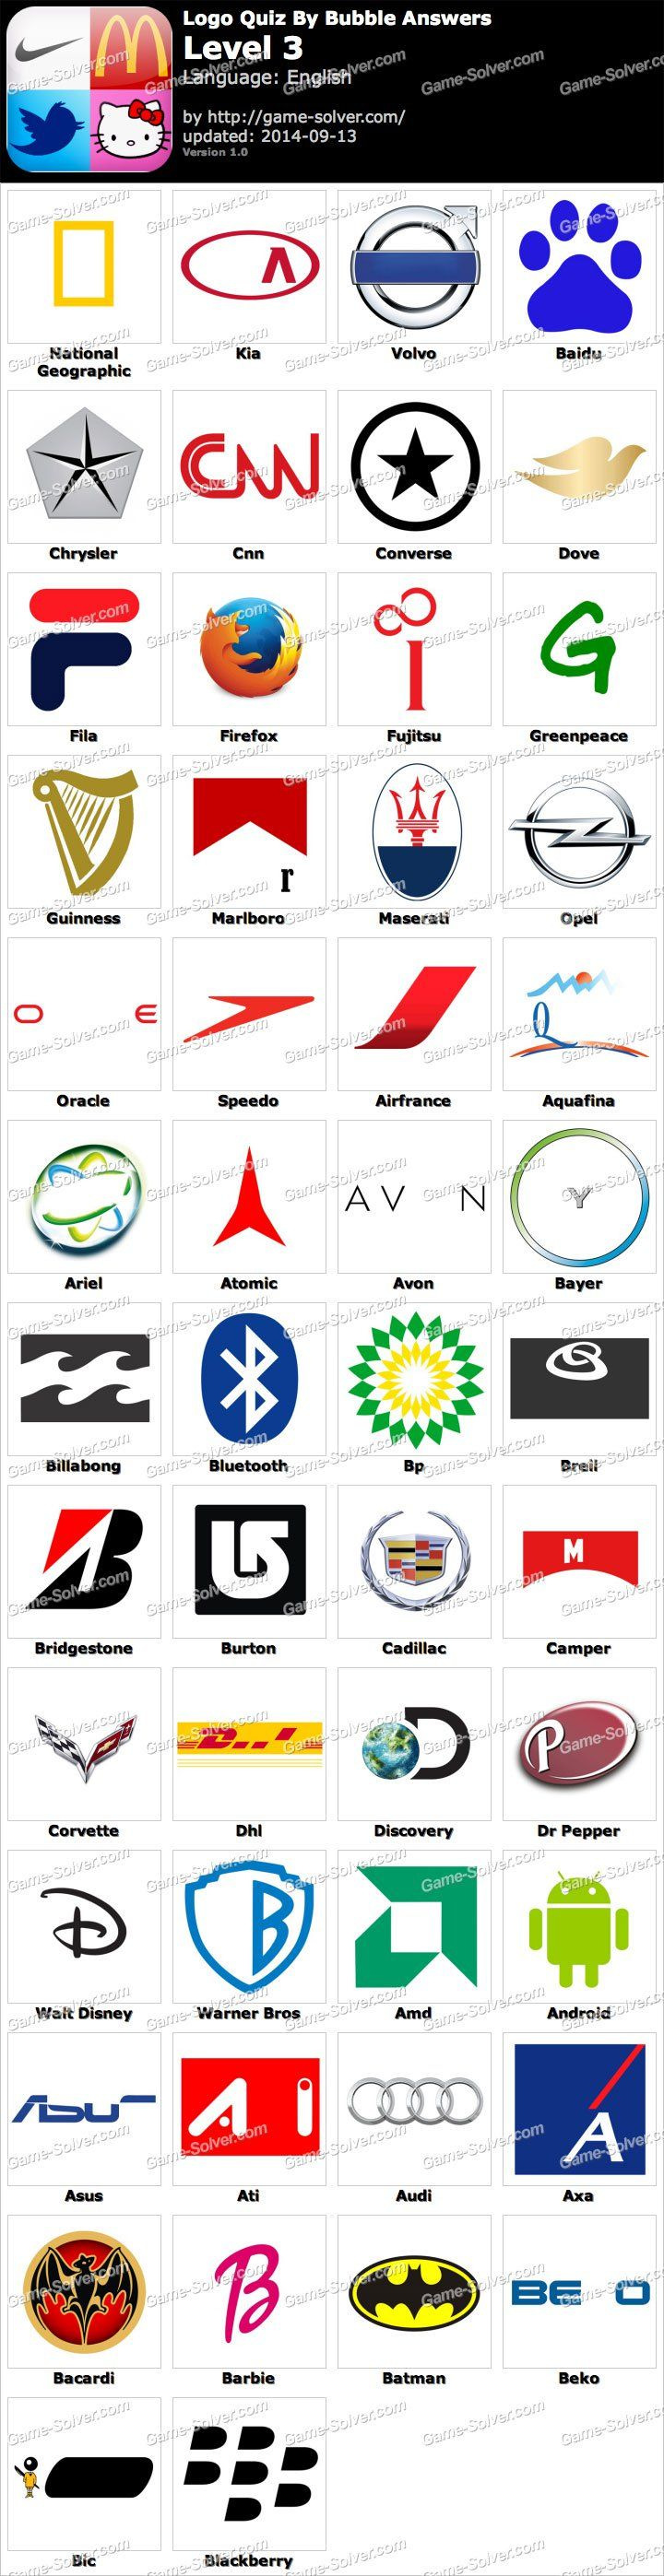 Logo Quiz By Bubble Answers Level 3 Logo quiz, Logo quiz